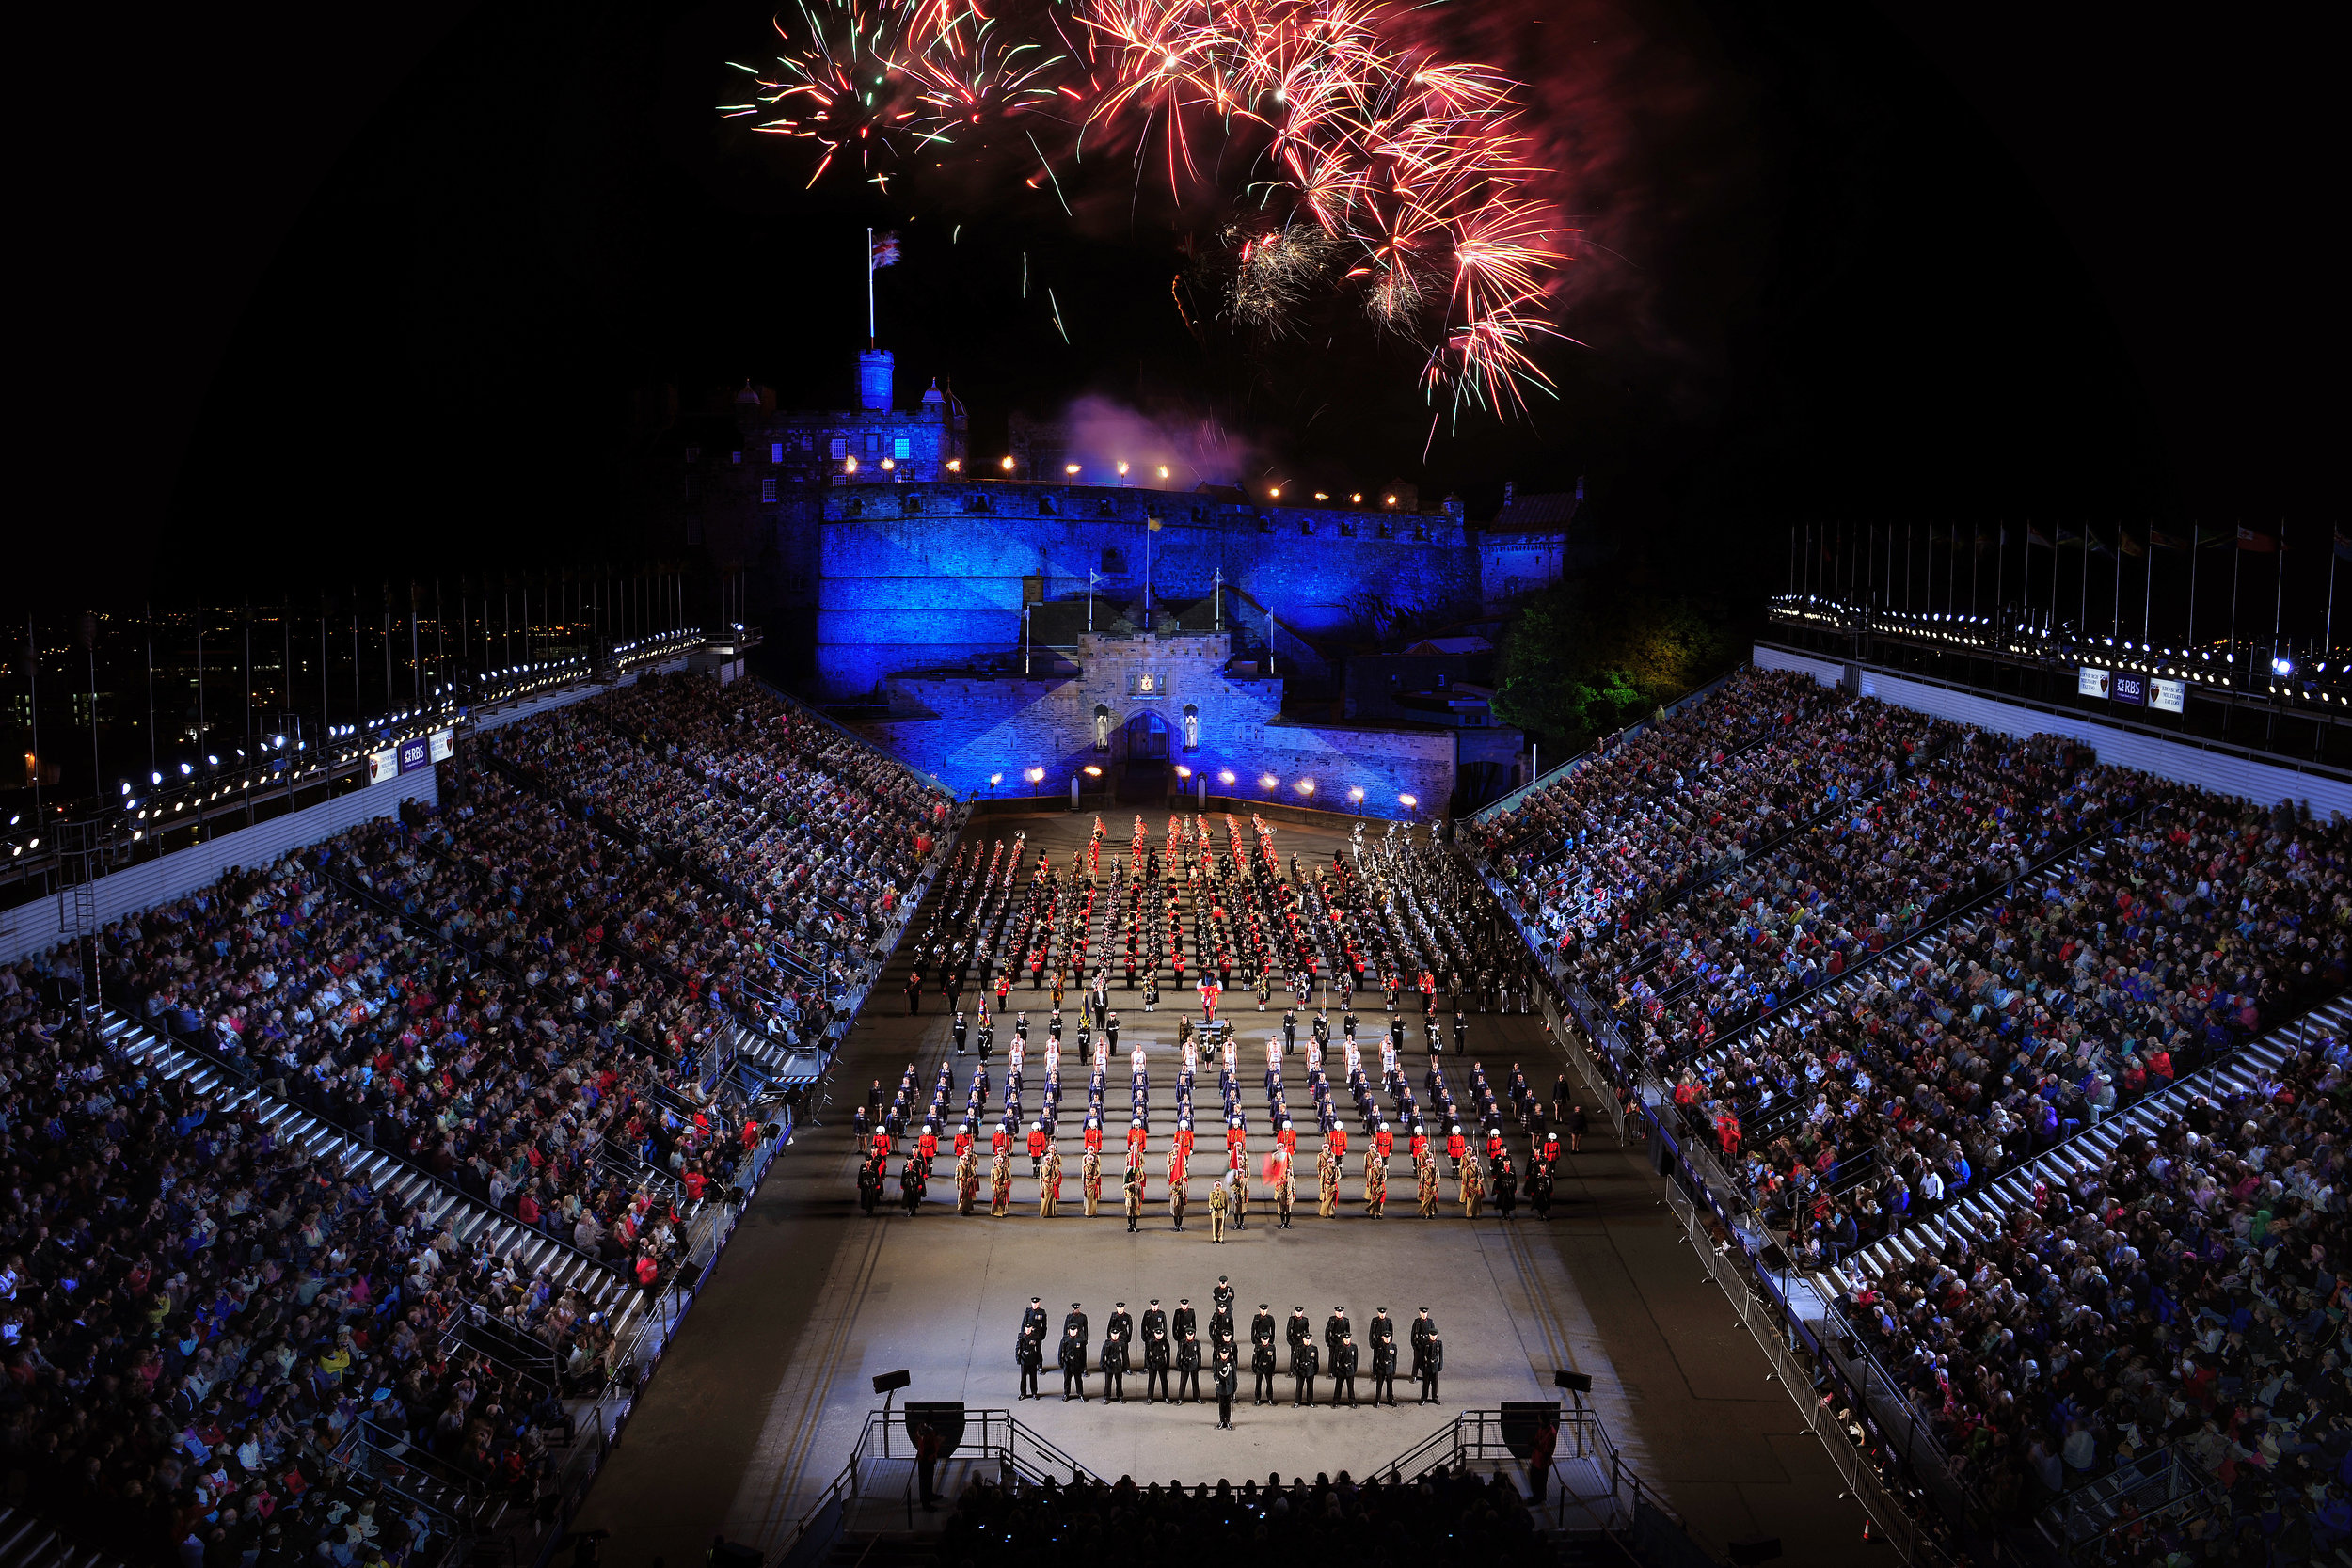 Royal_Edinburgh_Military_Tattoo_(2)_original.jpg